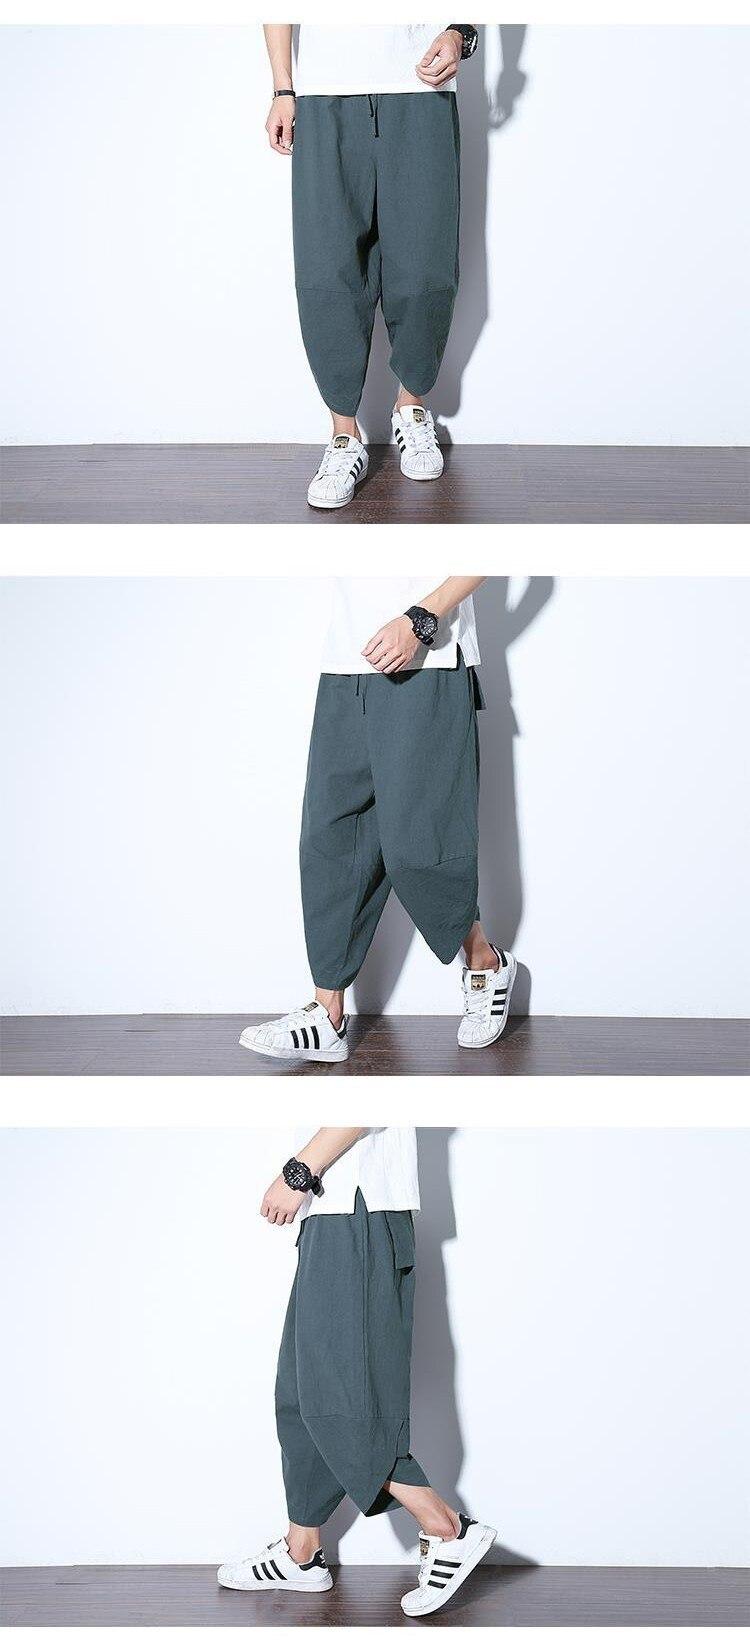 2019 Spring Loose Calf-length Pants Chinese Style Cotton Linen Trousers Jogger Pants Women M-xxxl Drawstring Streetwear Pants Home